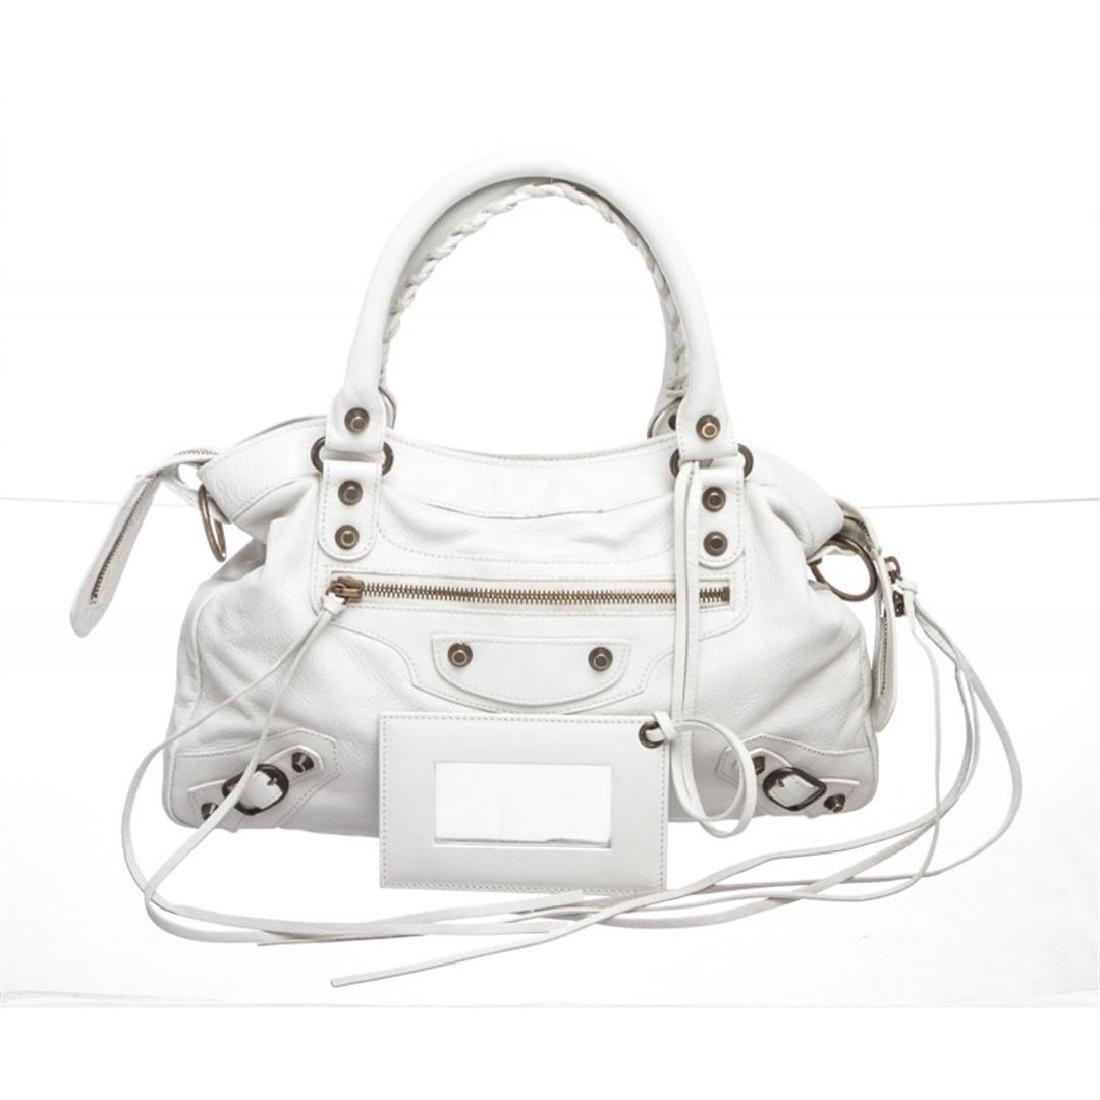 Balenciaga White Leather Classic Town Bag Satchel